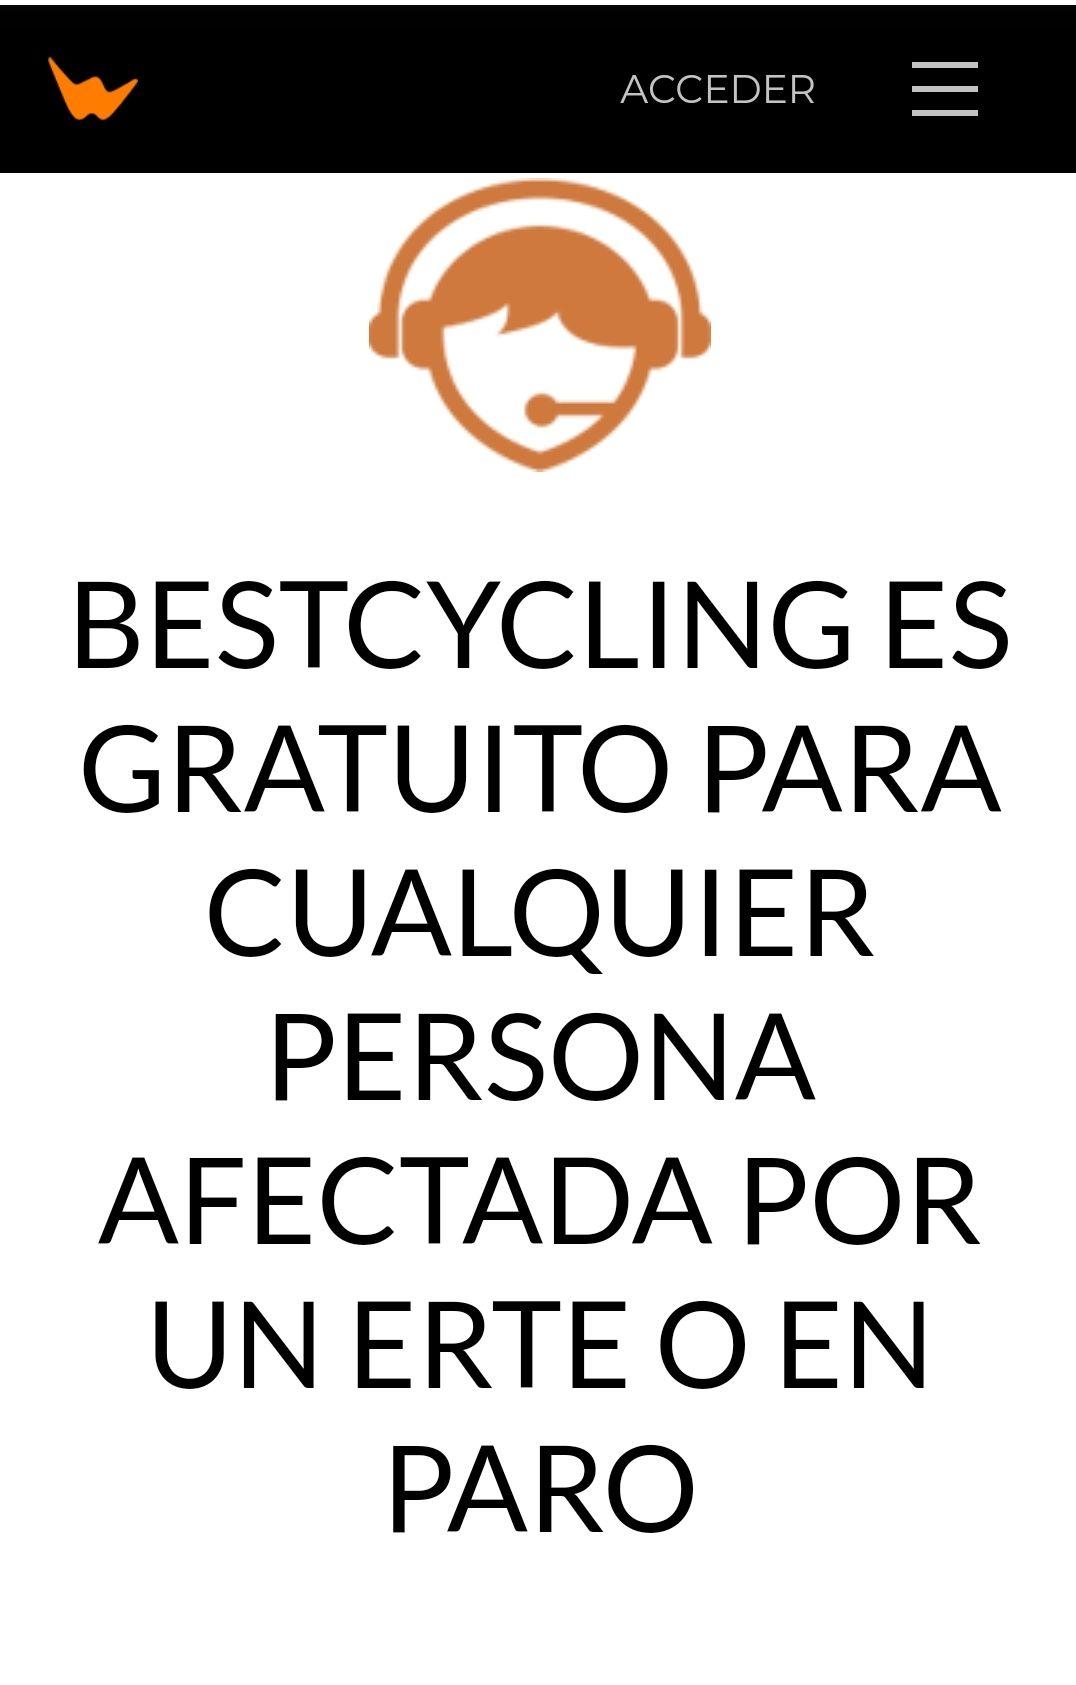 BestCycling gratis para gente en ERTE o PARO